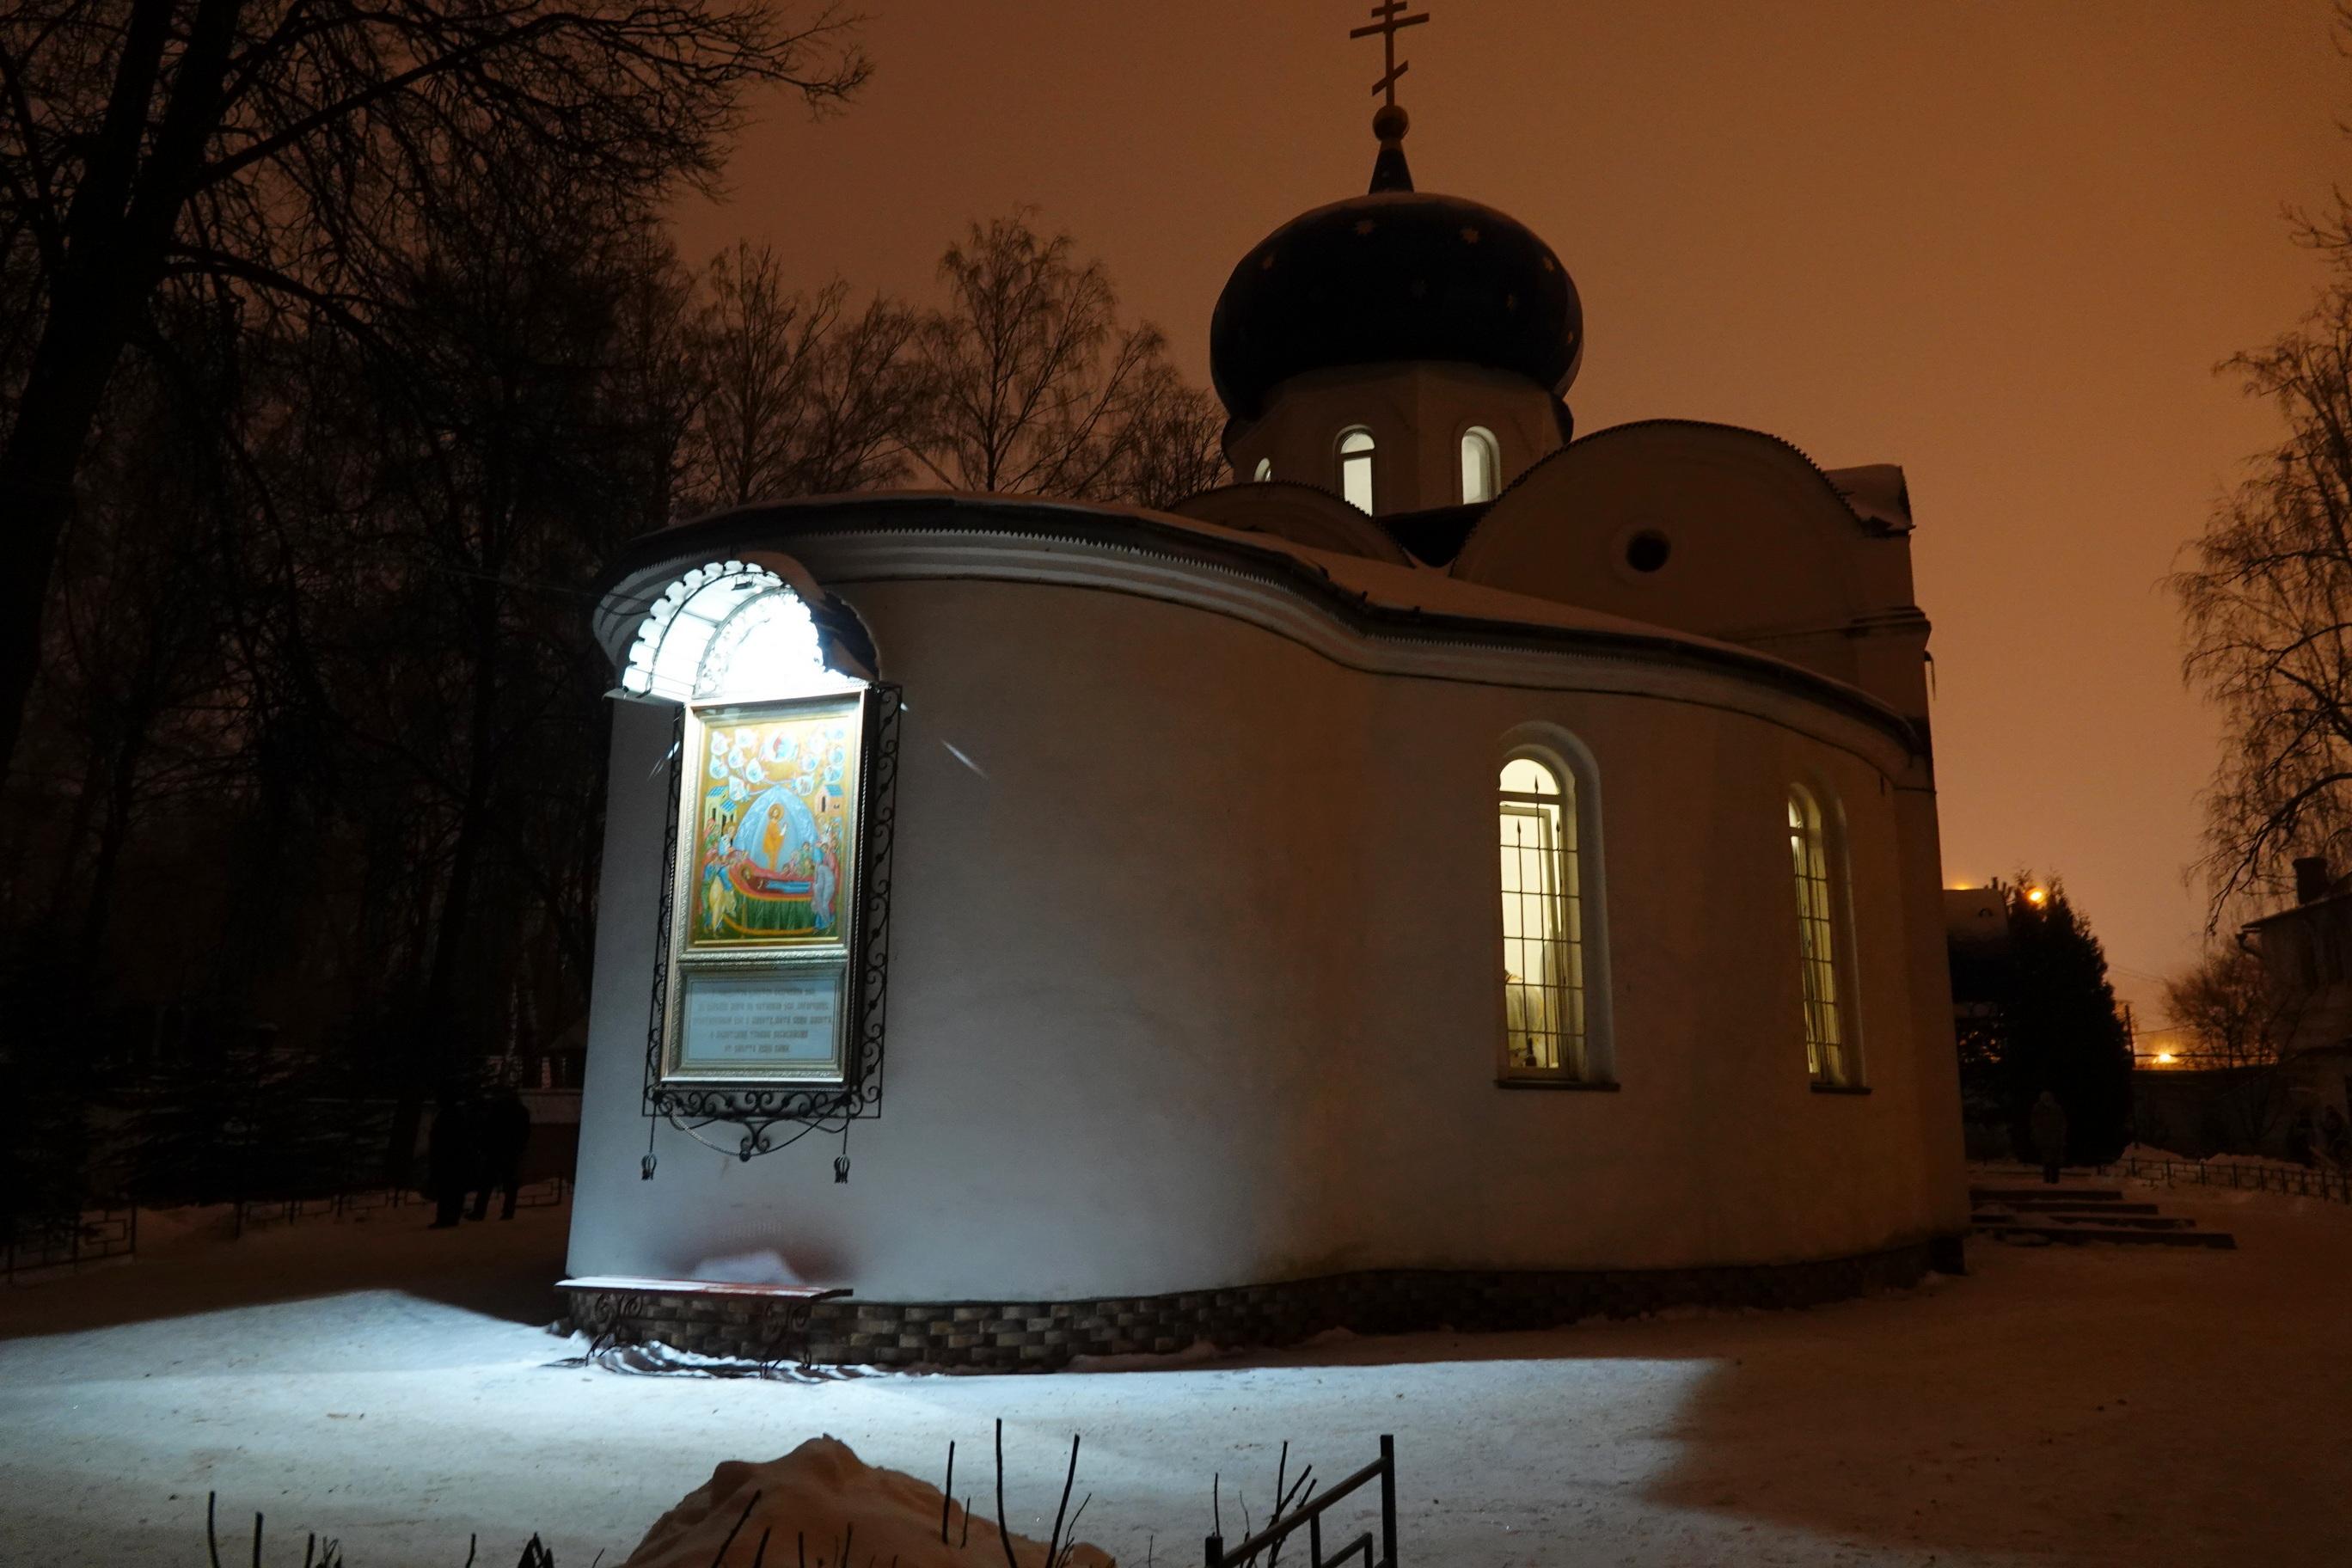 http://monuspen.ru/photoreports/3d7fbef525c35f6bf9338038ee12138o.JPG